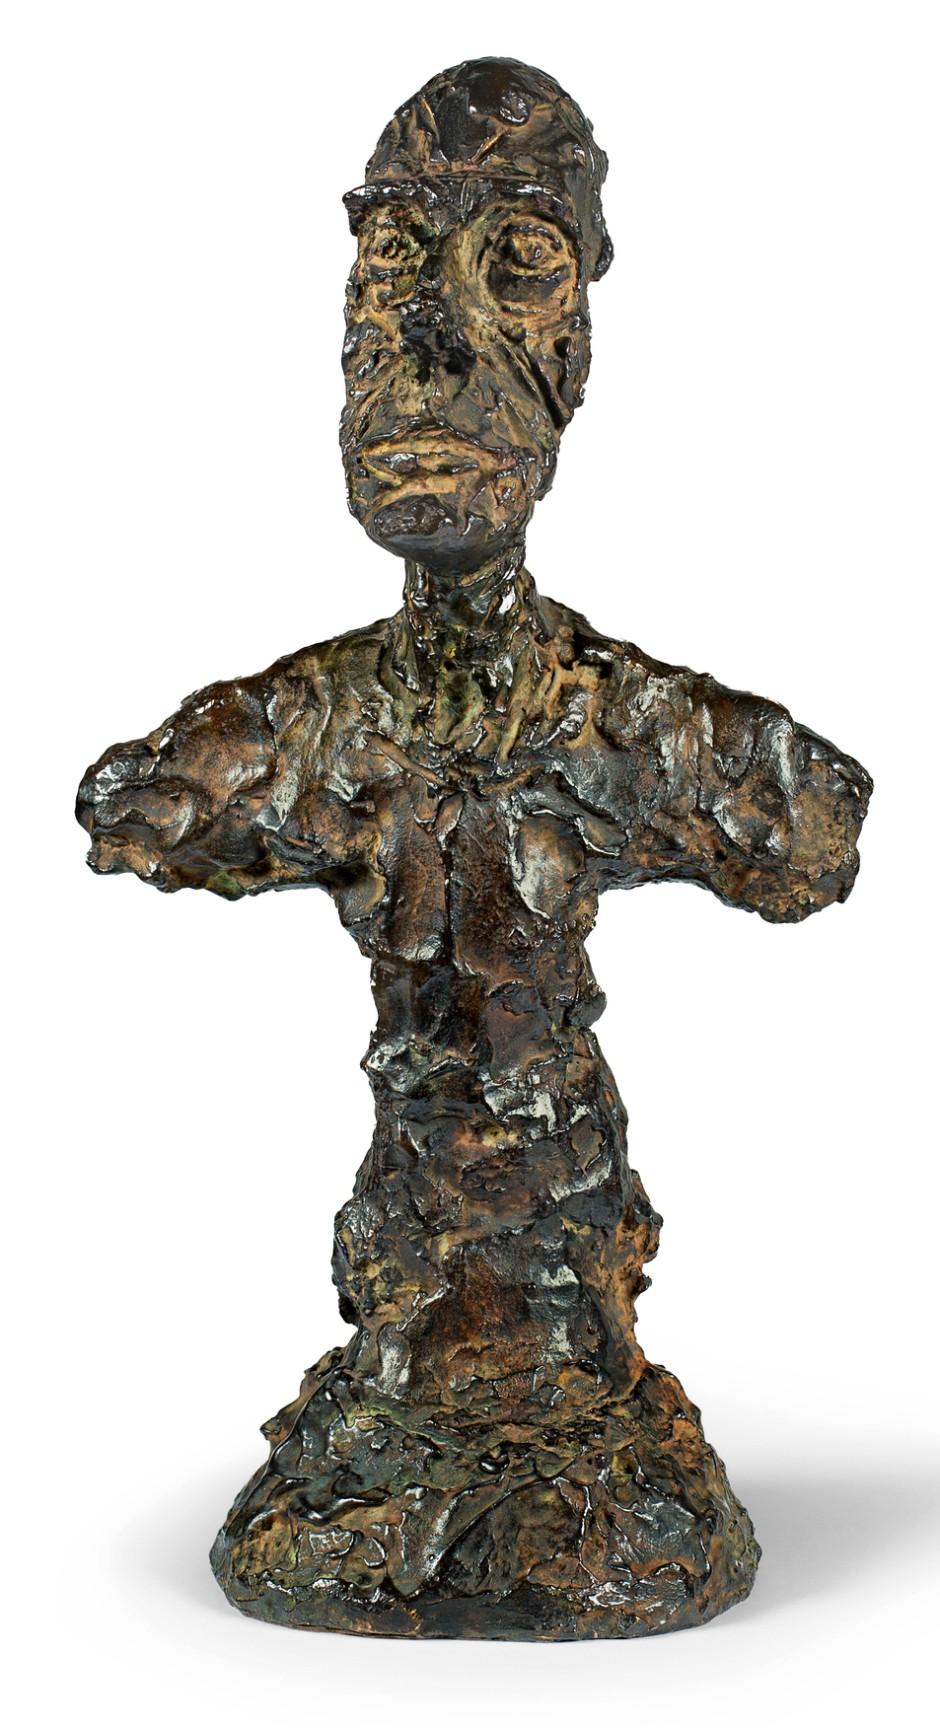 "Bildnis seines Bruders Diego: Alberto Giacometti, ""Buste d'Homme (New York II)"", 1965, Bronze, Guss 1972, 46 Zentimeter hoch, Taxe 1,5 Millionen Franken."